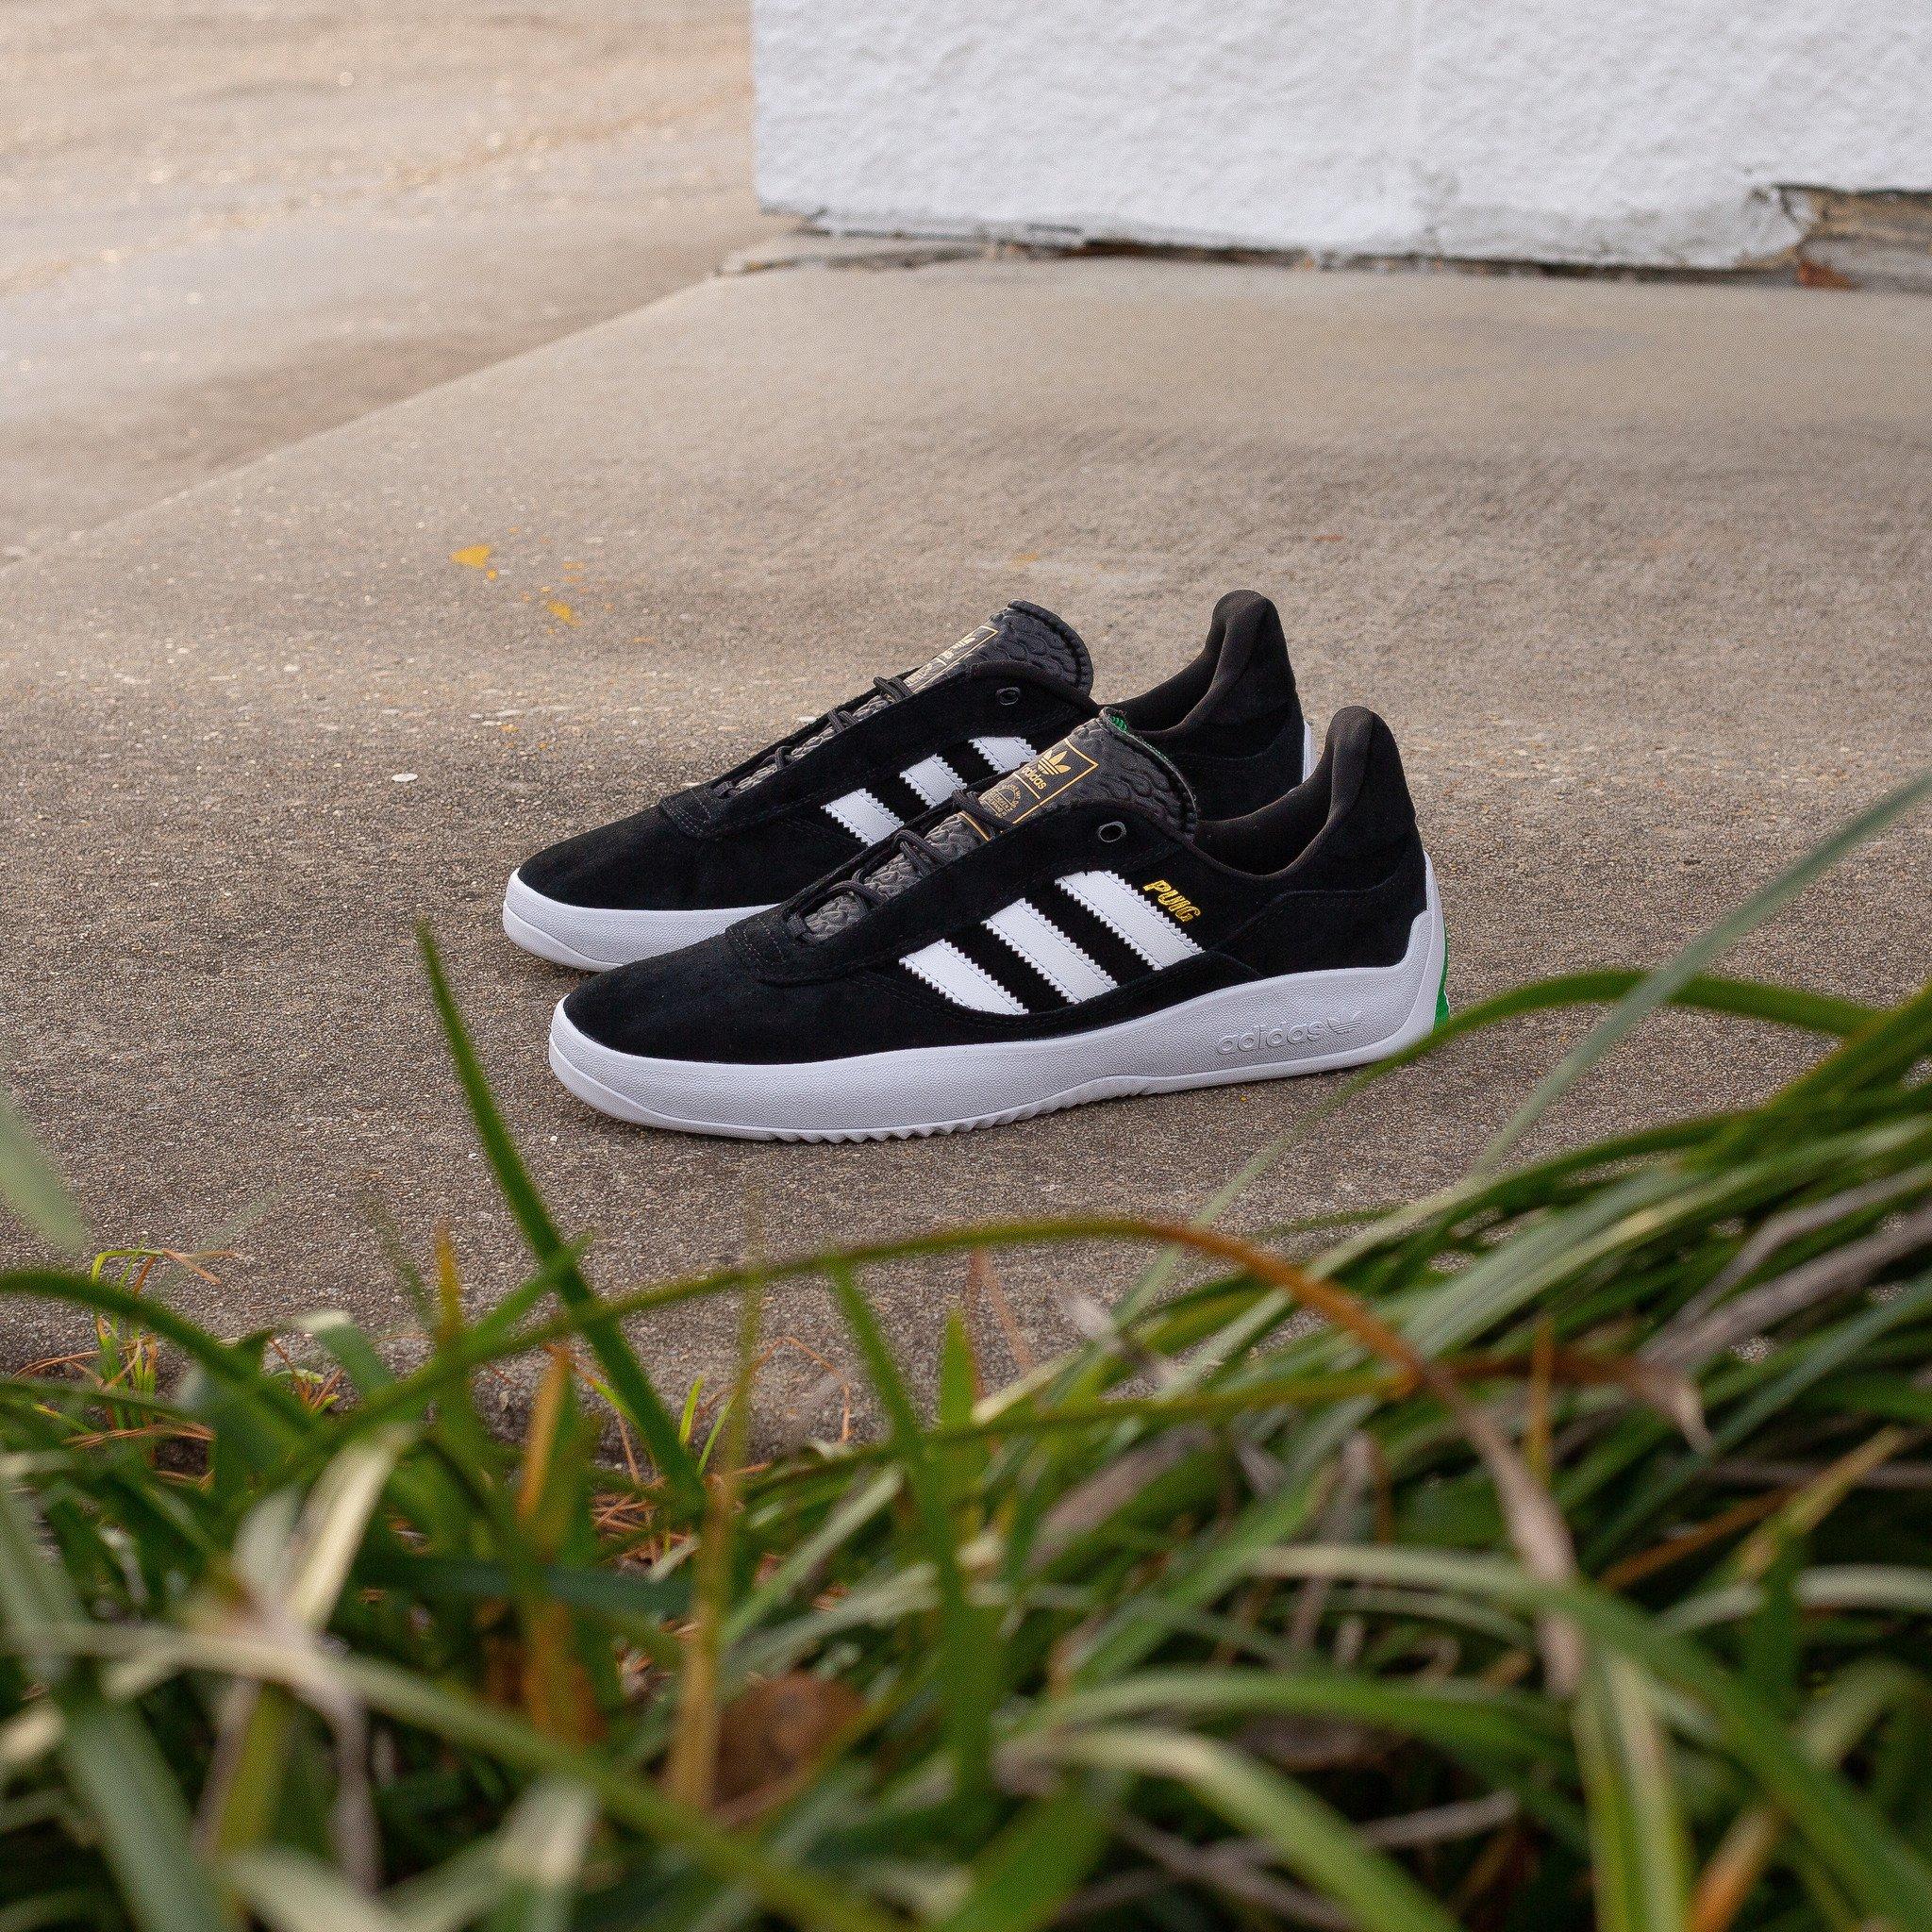 adidas Puig black white